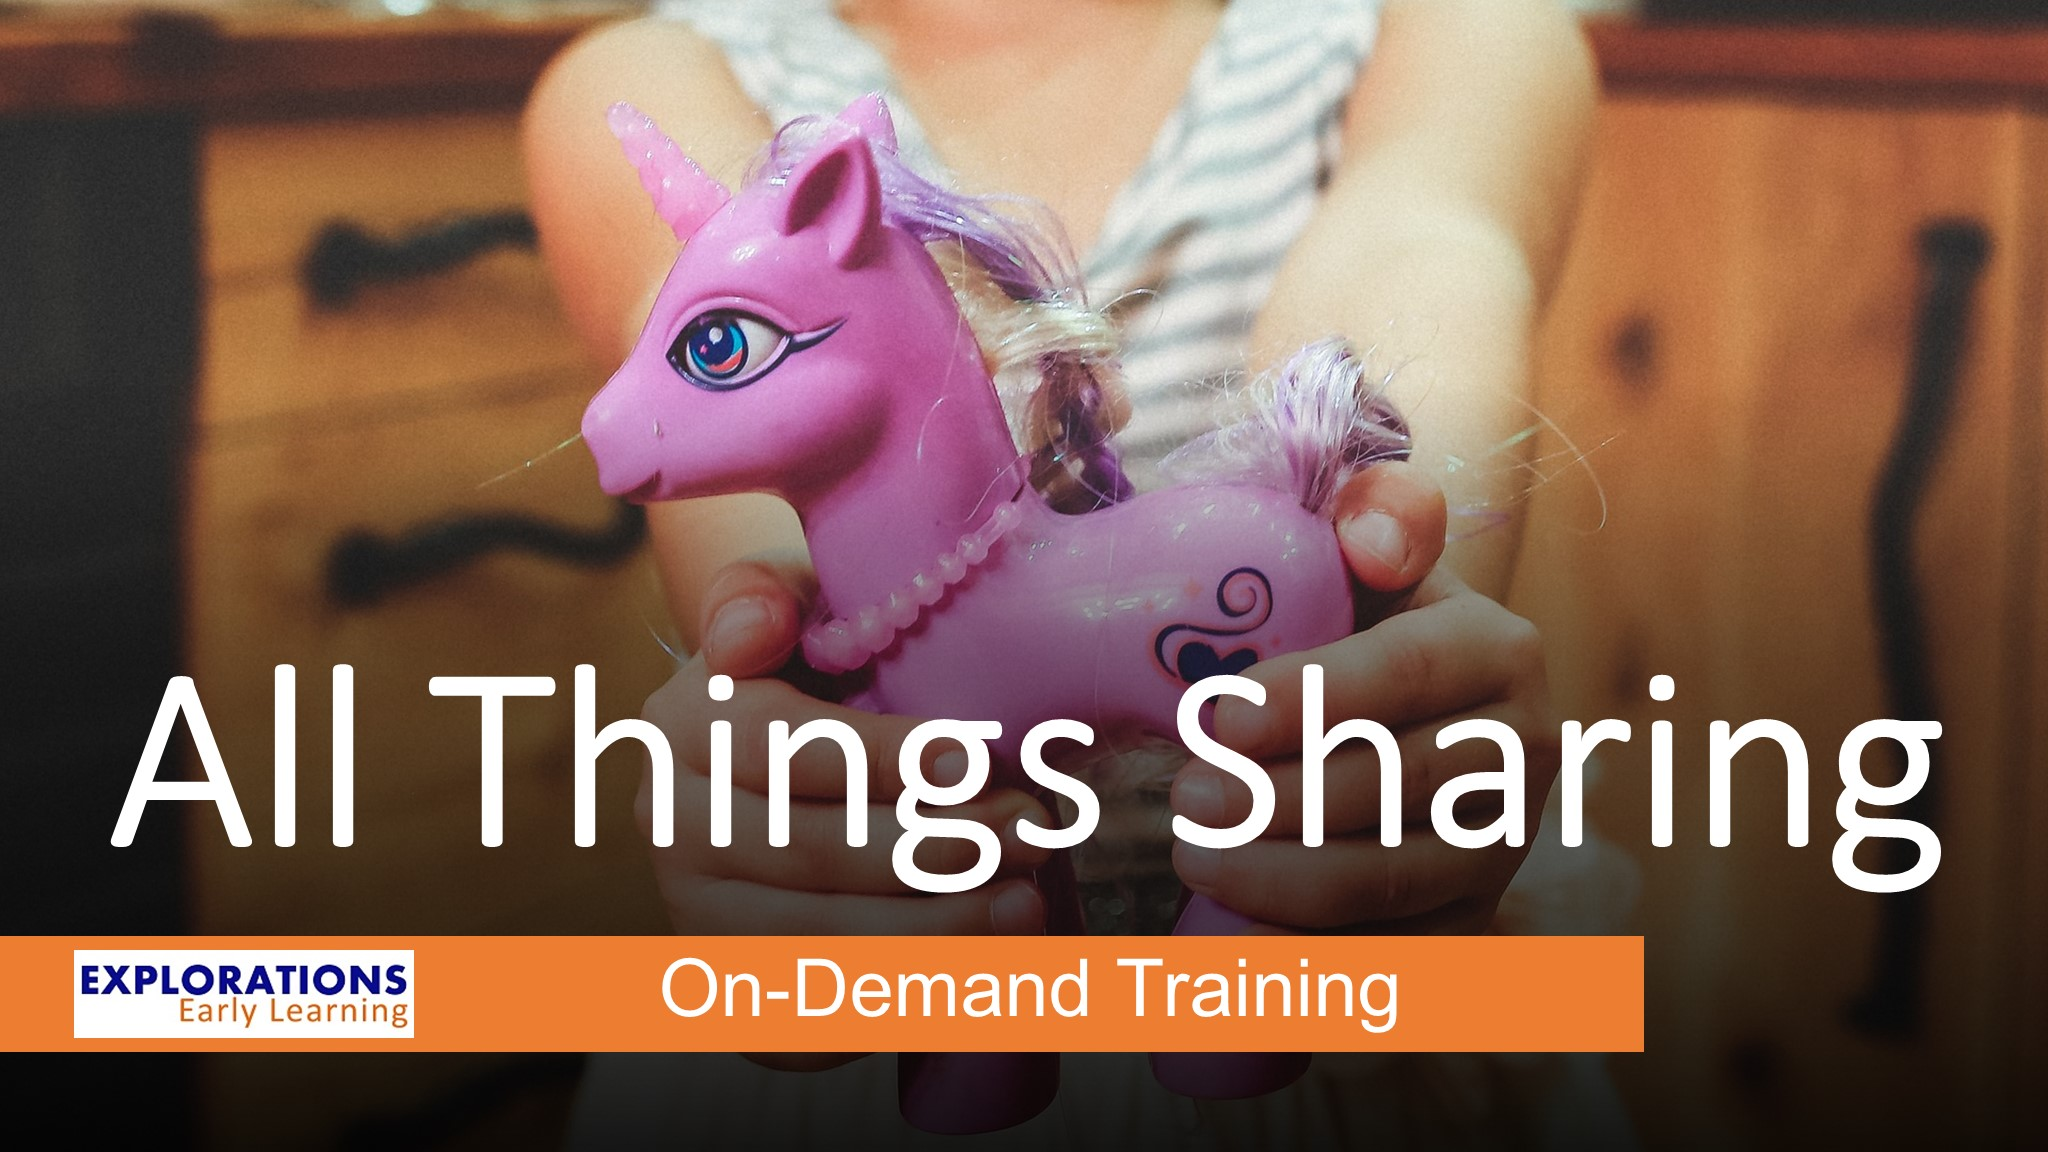 All Things Sharing